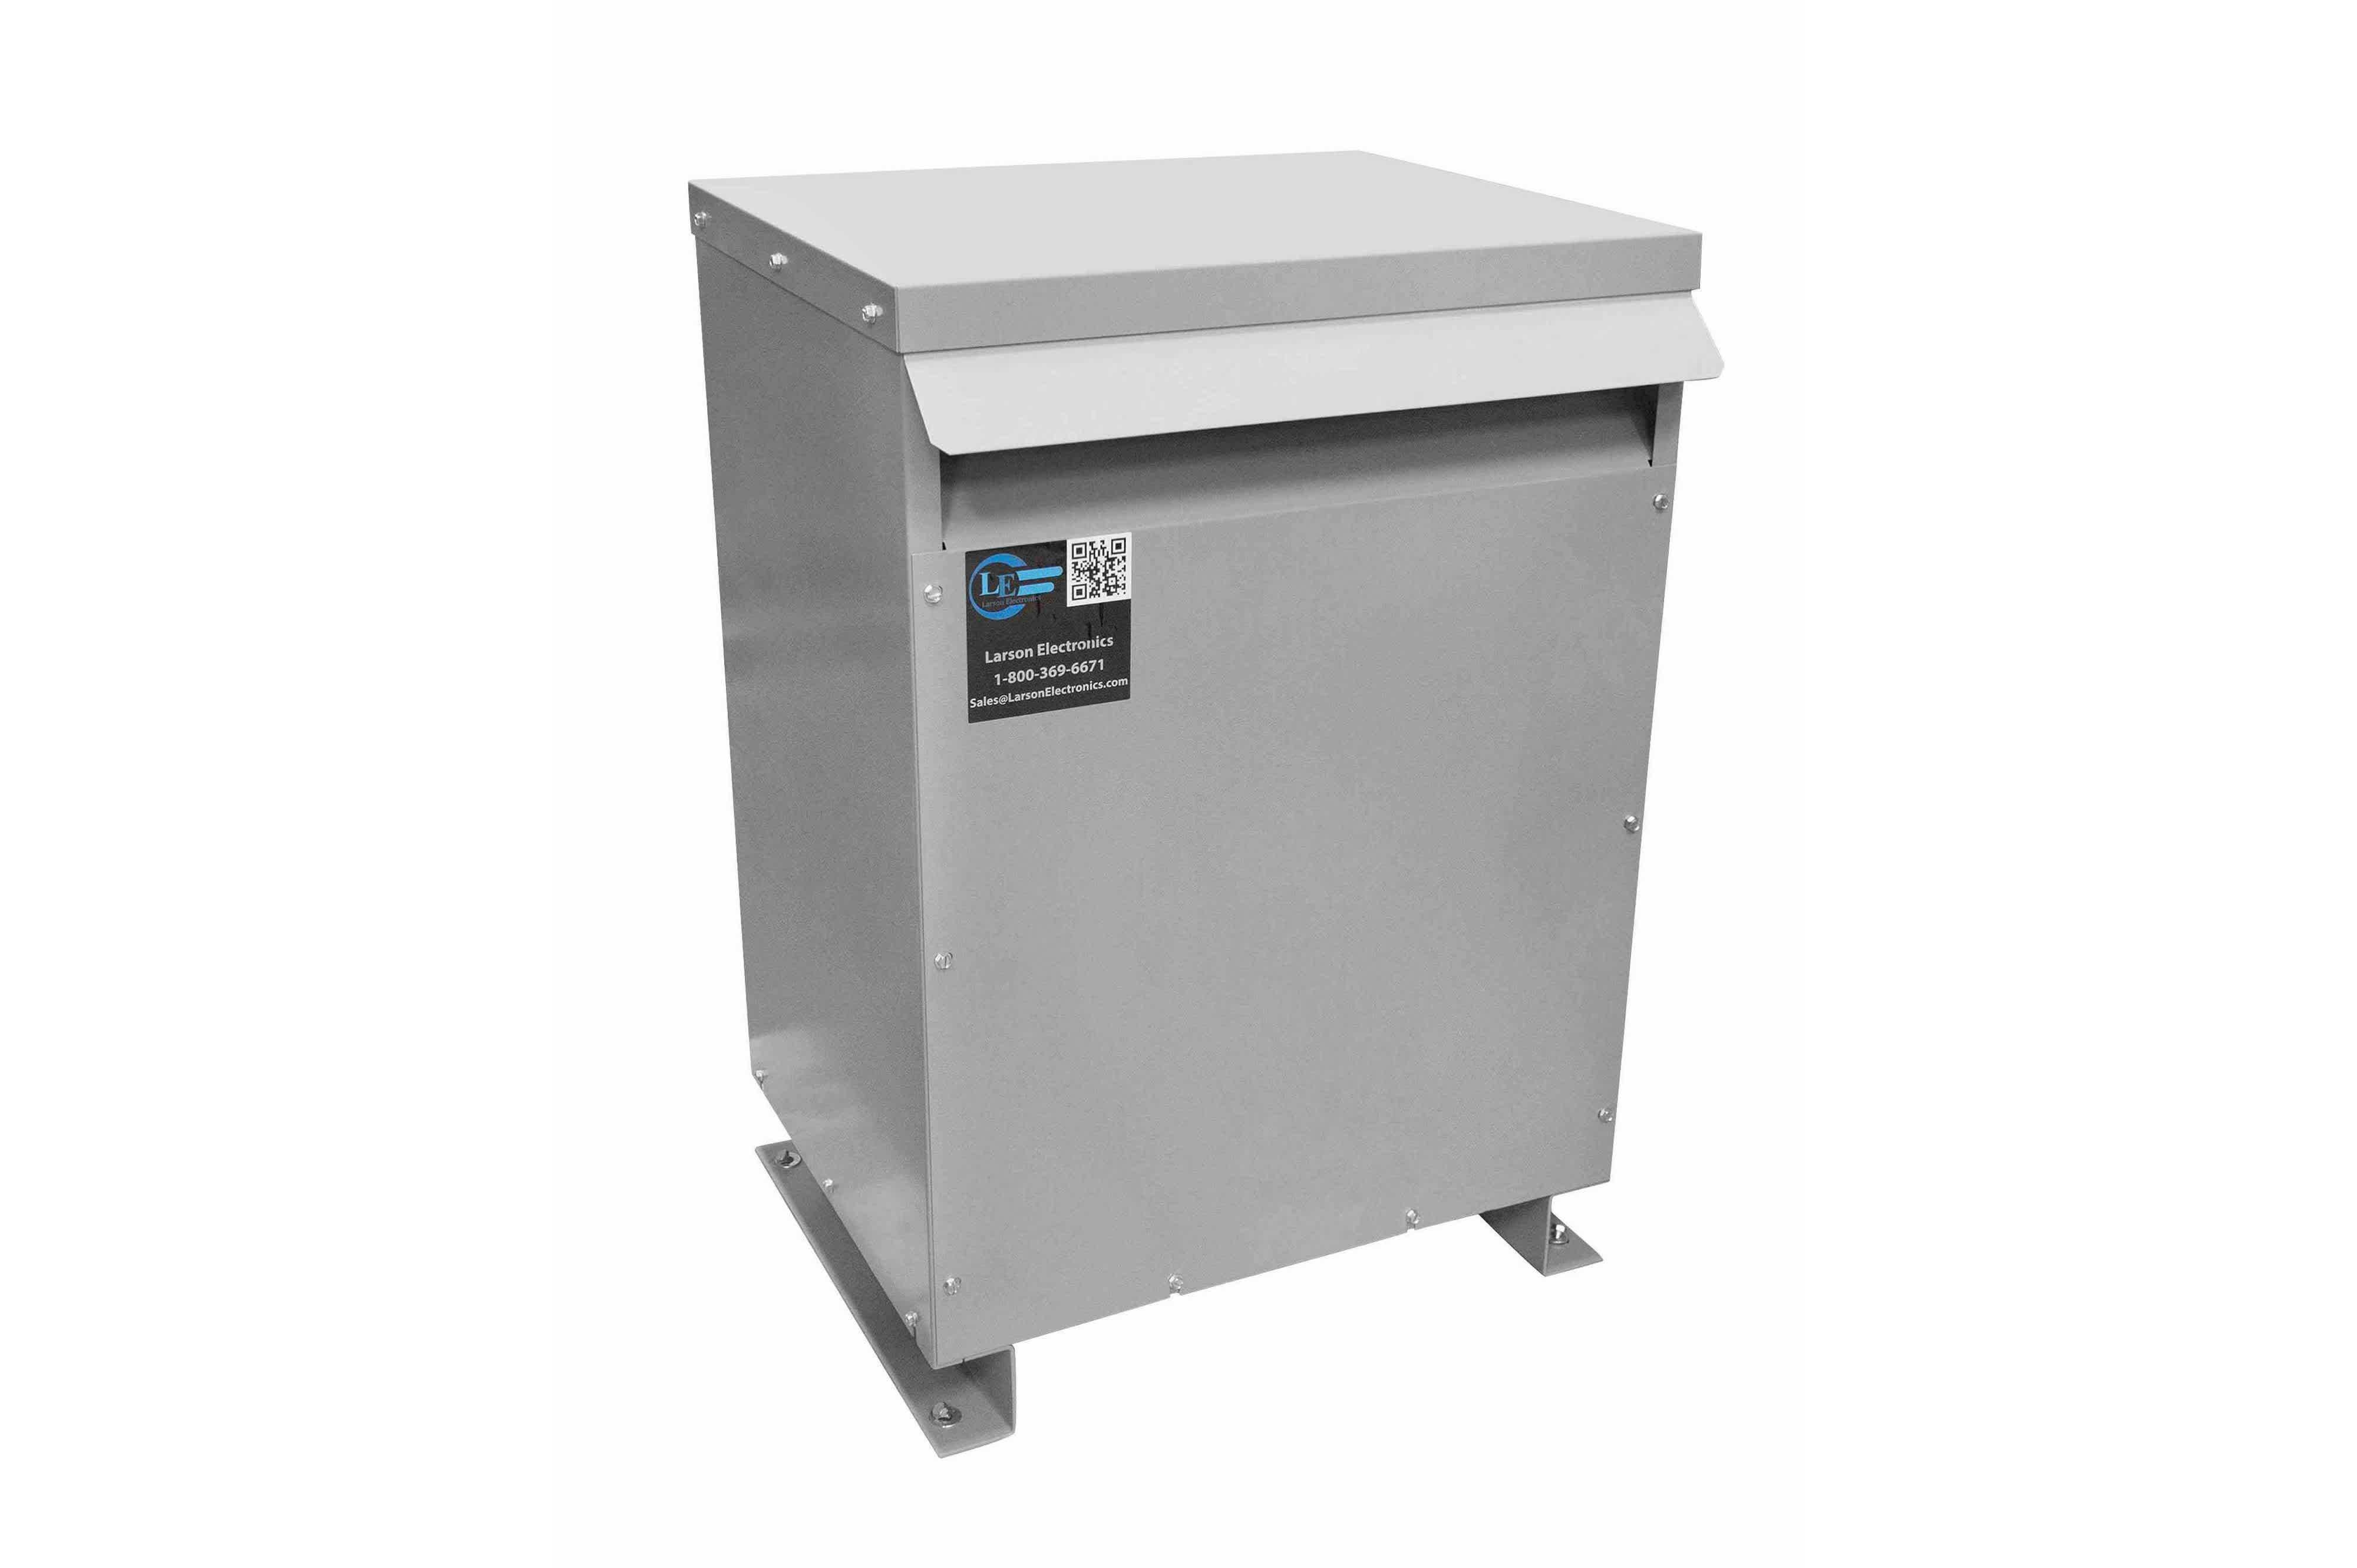 11 kVA 3PH Isolation Transformer, 380V Wye Primary, 240V/120 Delta Secondary, N3R, Ventilated, 60 Hz